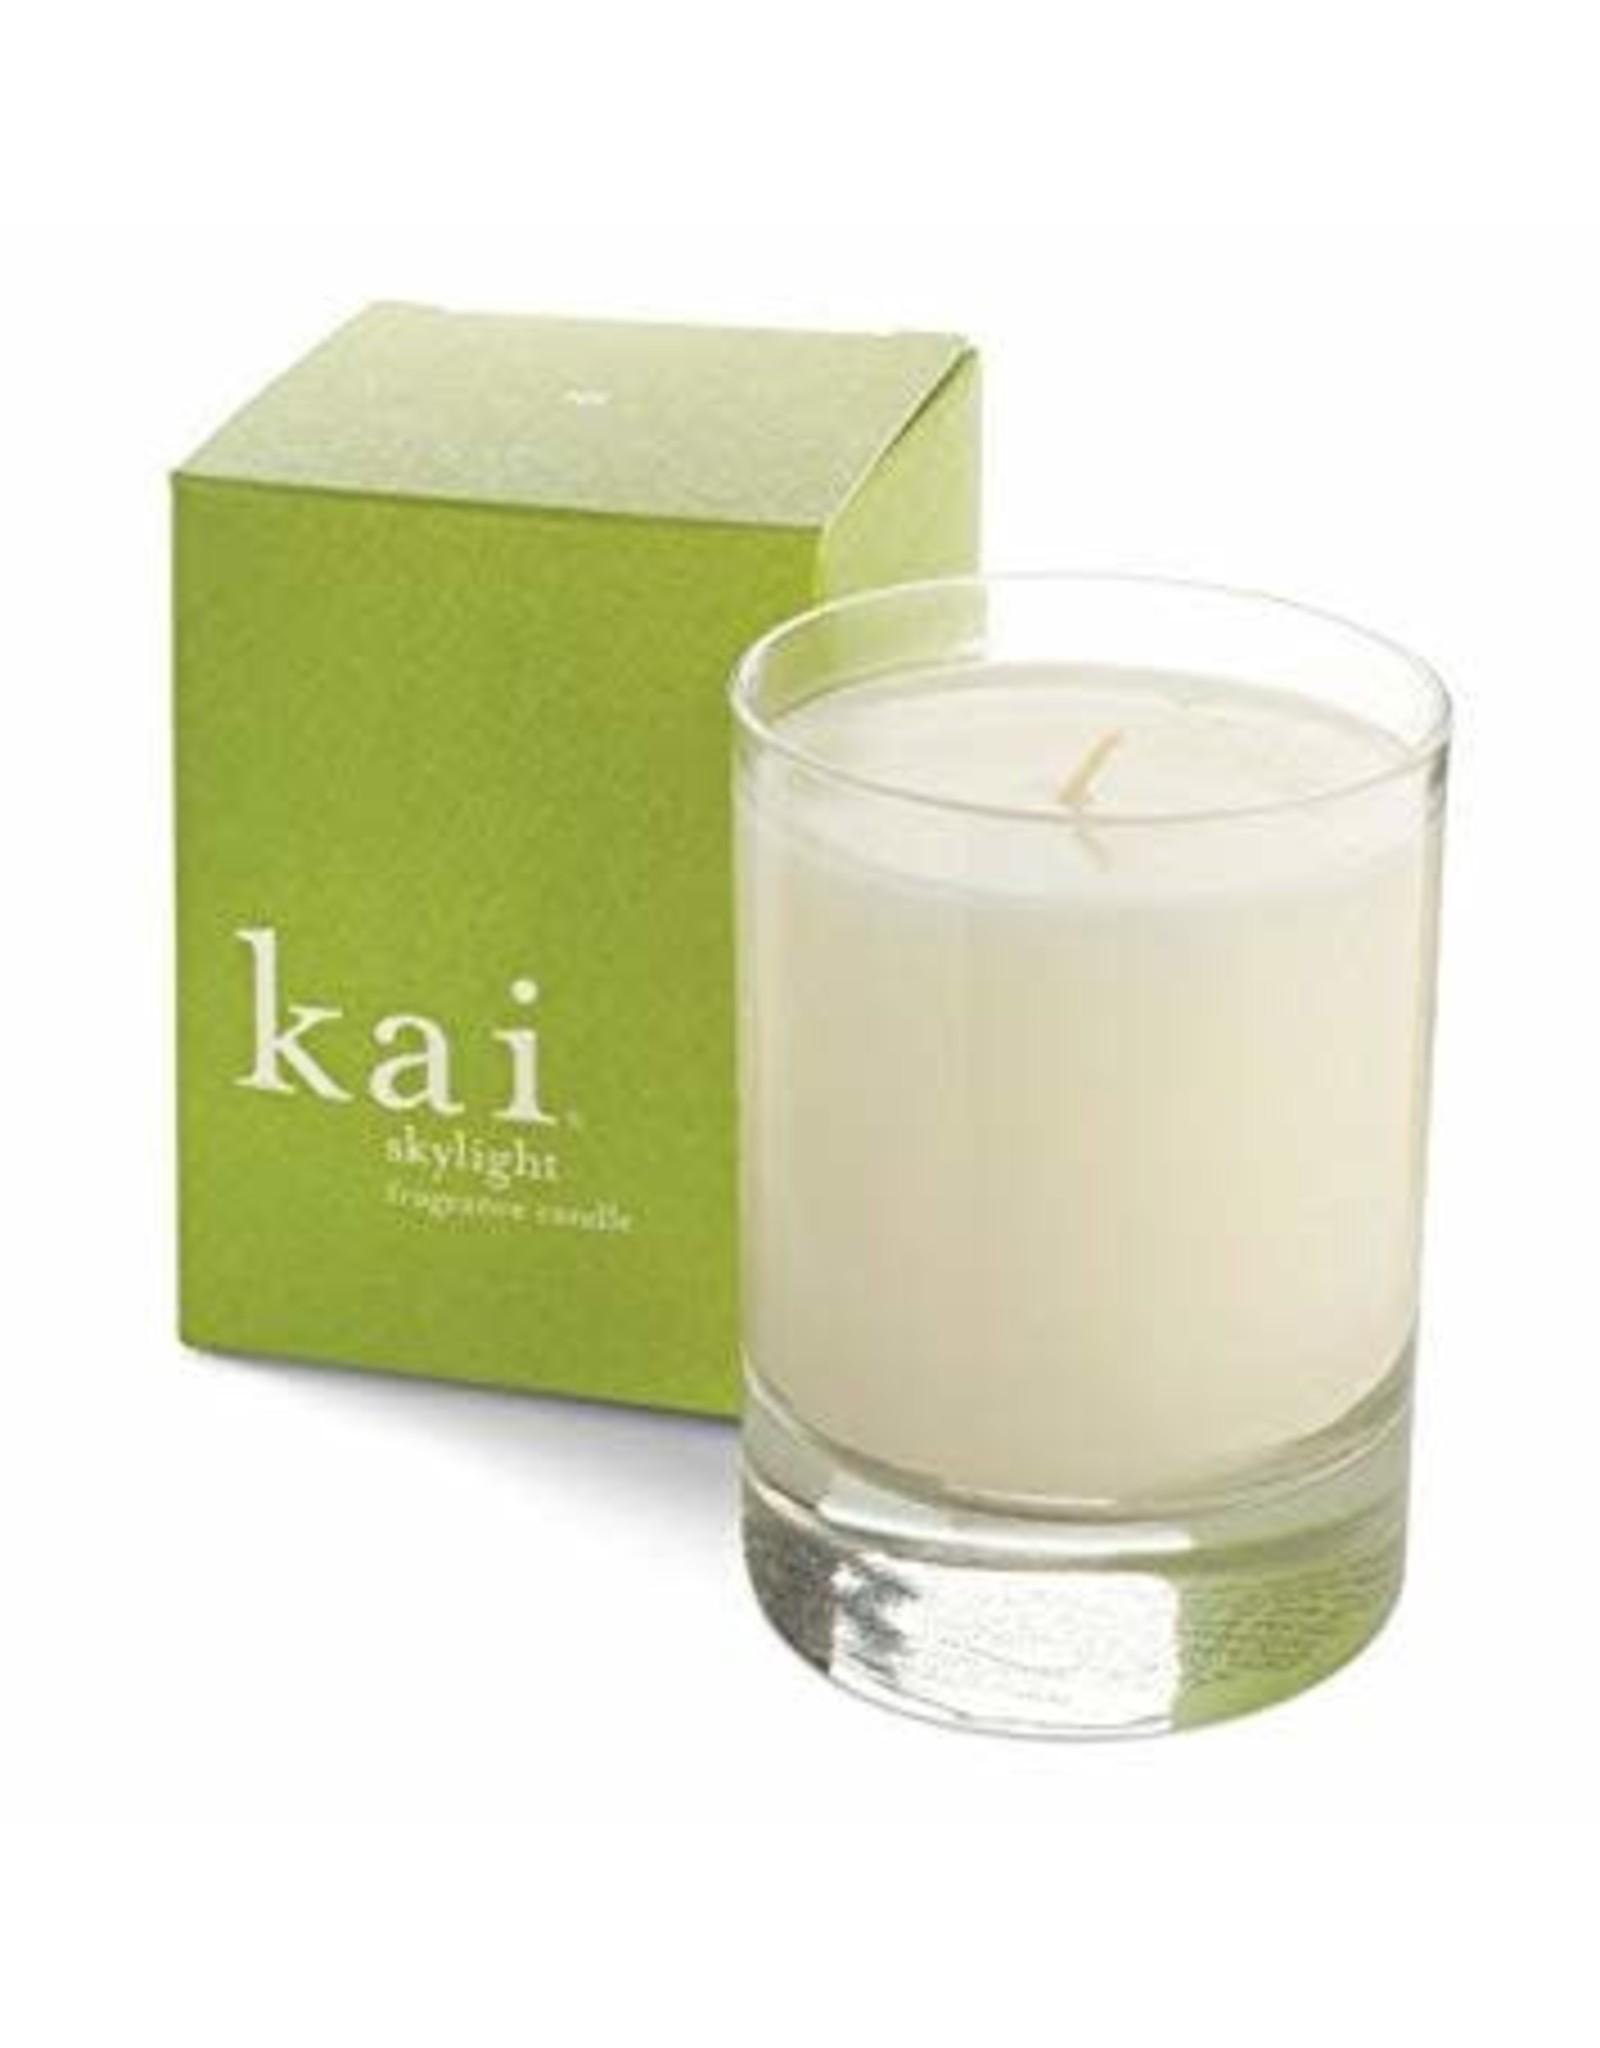 Kai Skylight Fragrance Candle| Kai